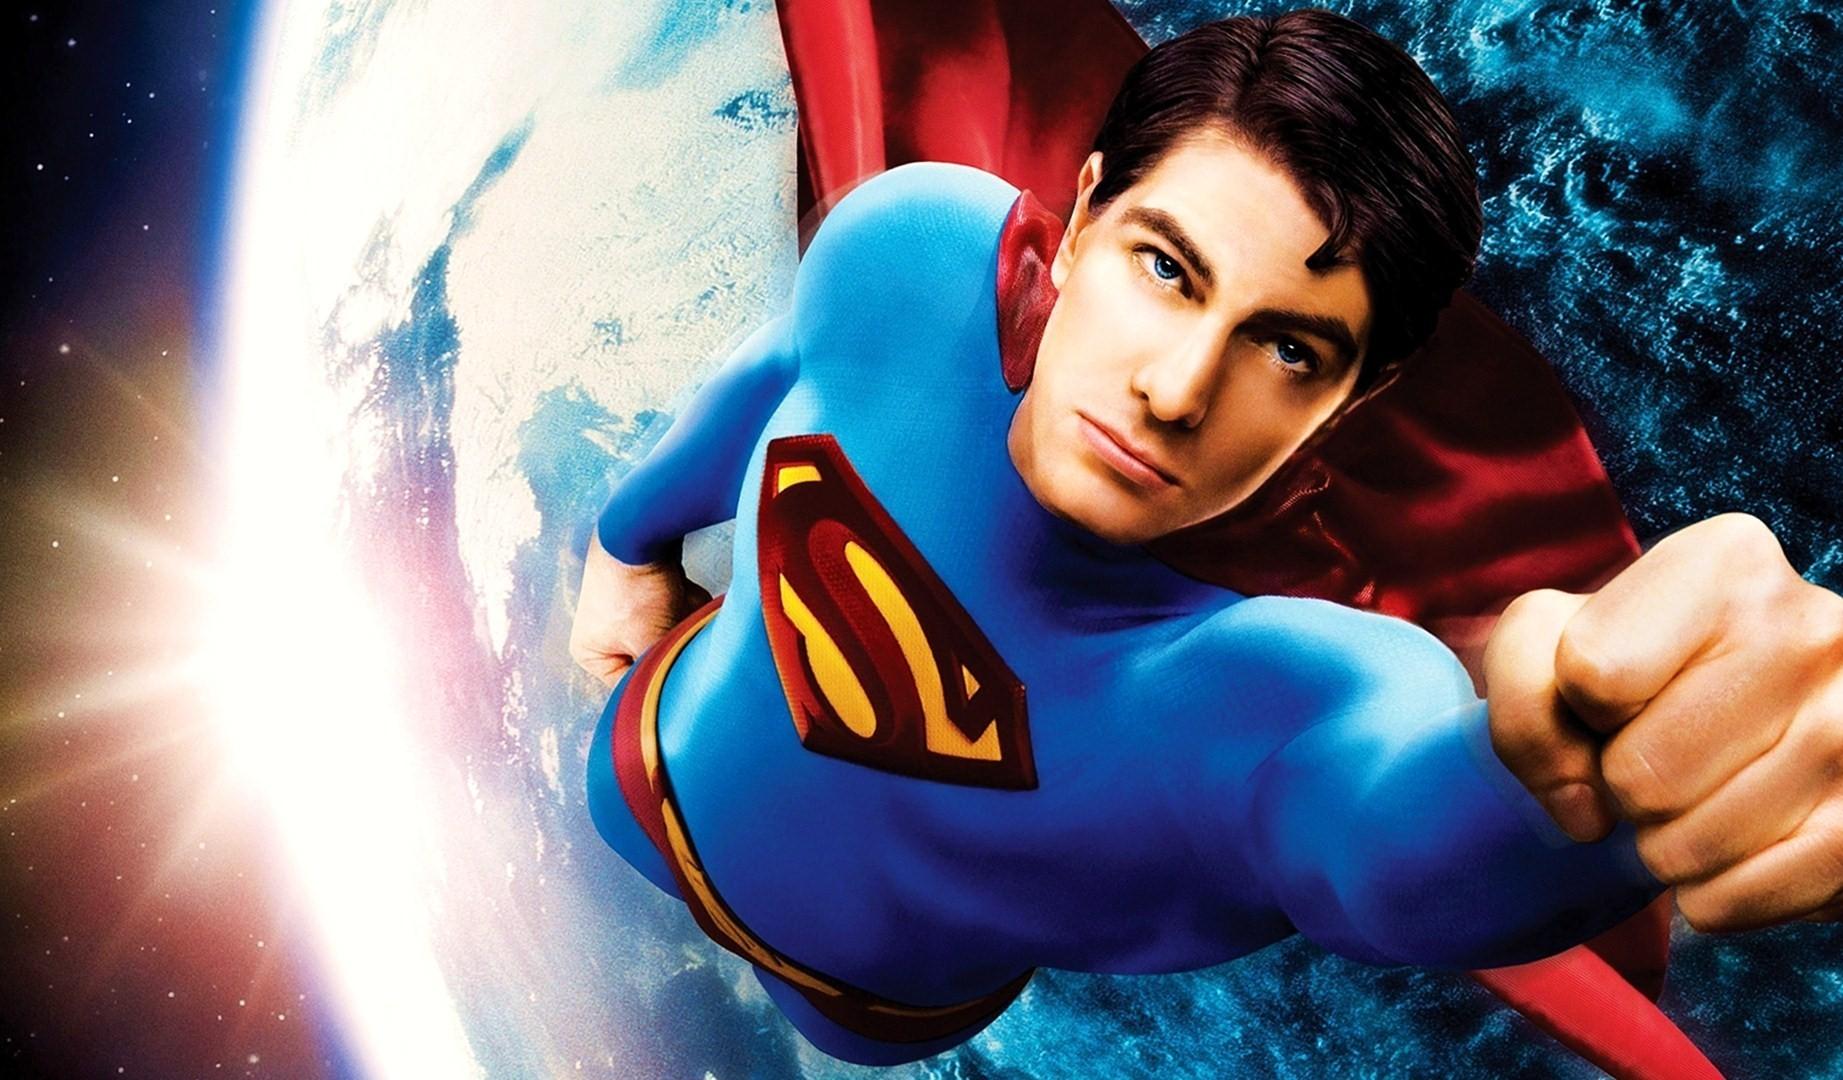 Film su Superman, la rinascita affidata a Matthew Vaughn